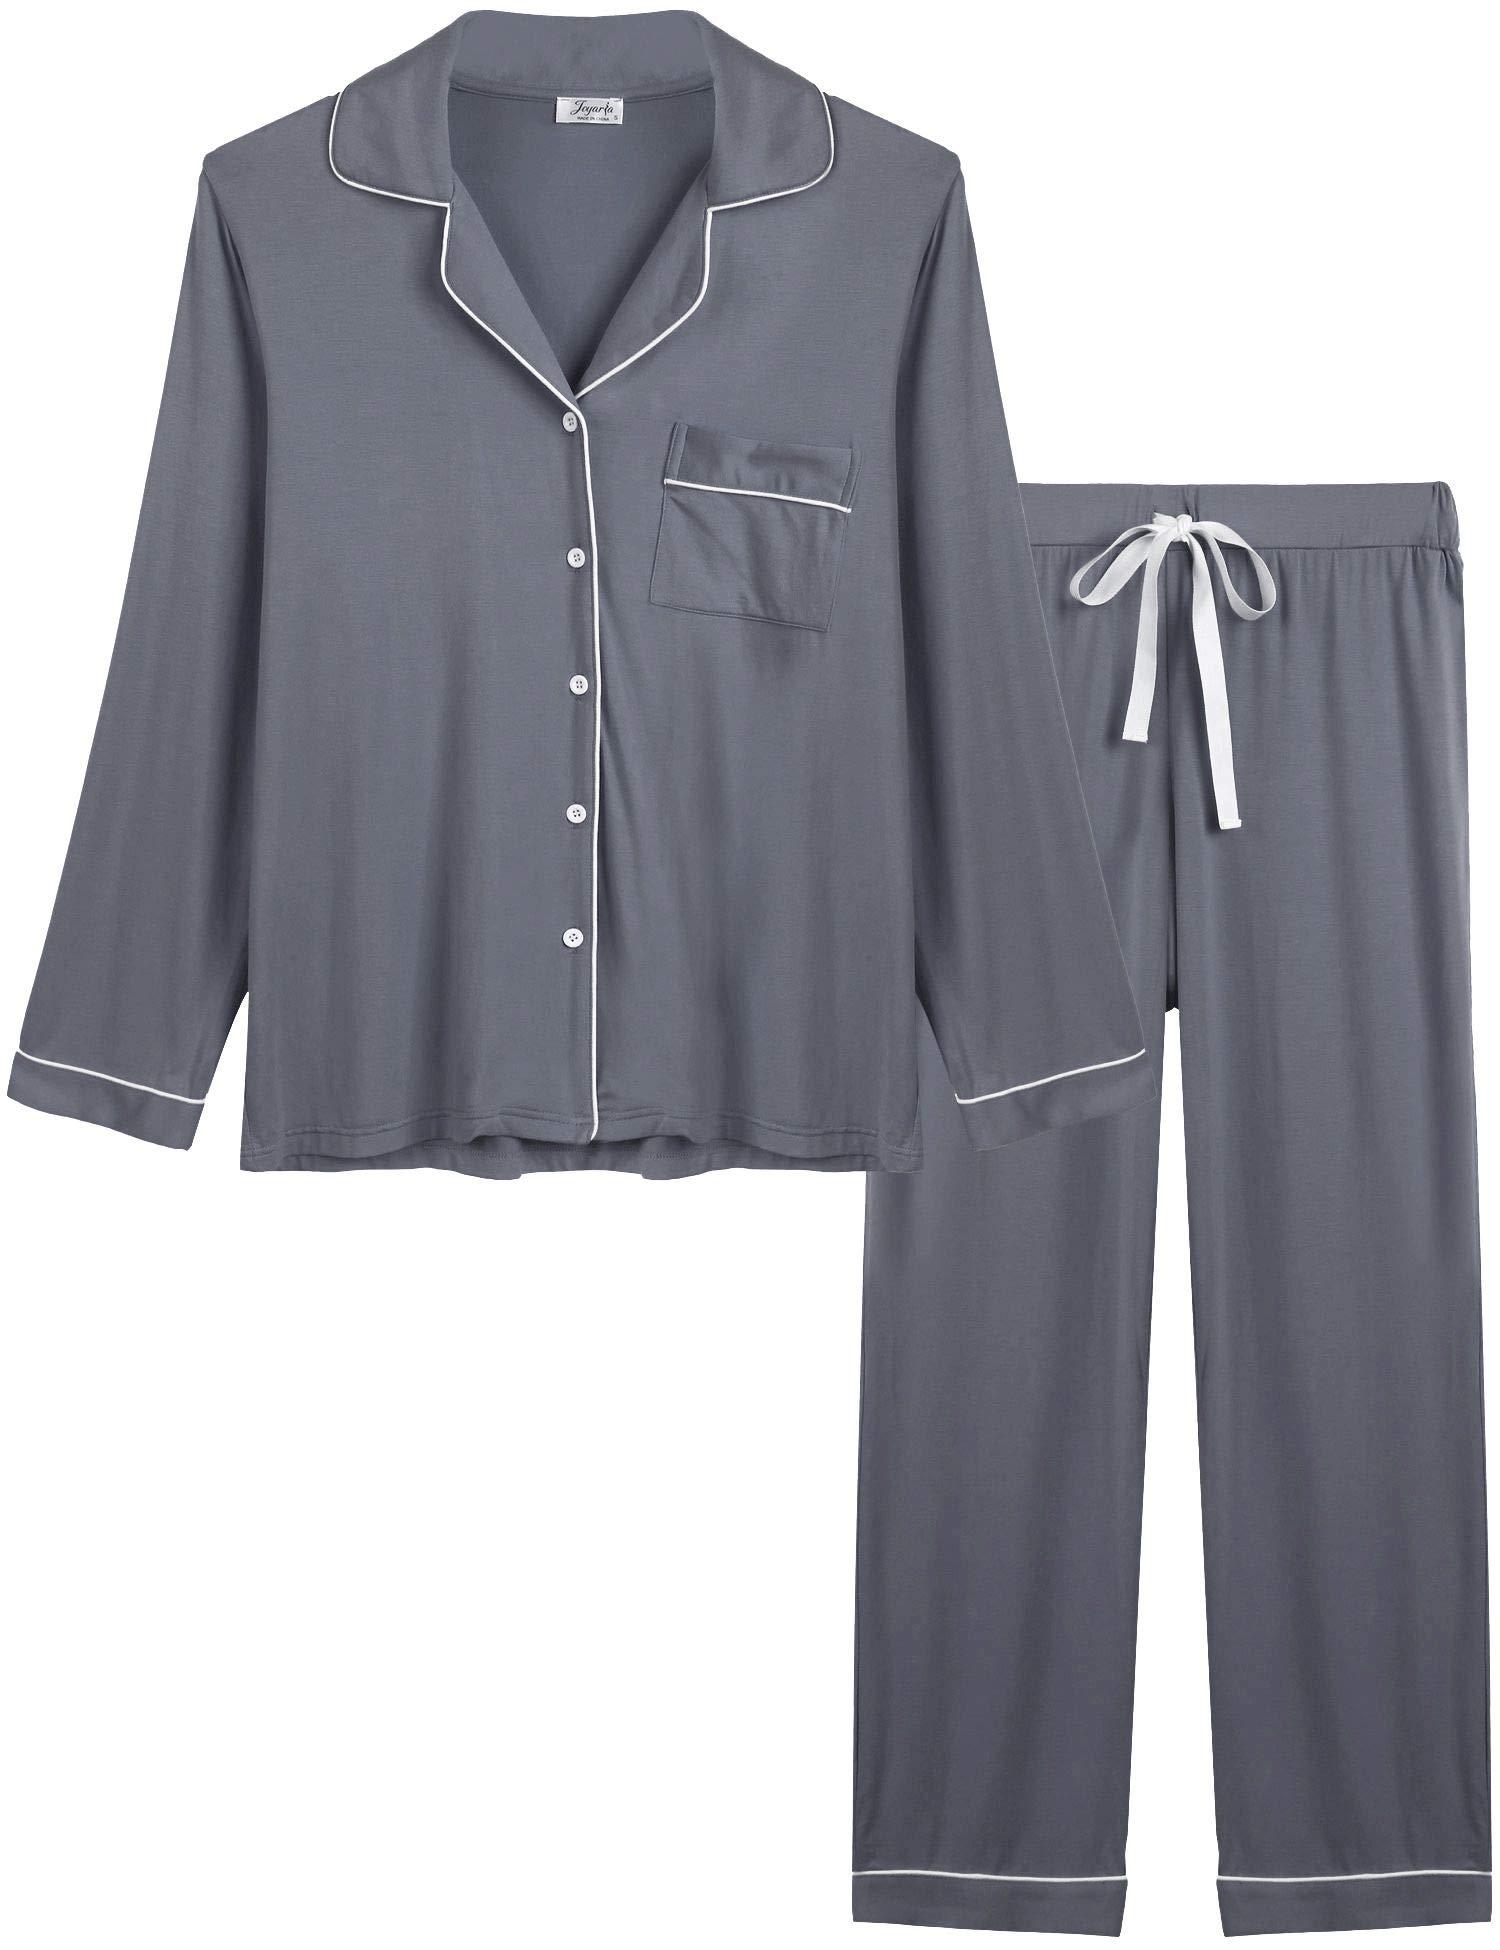 Joyaria Ladies Comfy Bamboo Pj Sets Button Down Long Sleeve Pajama Pants Set Loungewear (Gray, XL) by Joyaria